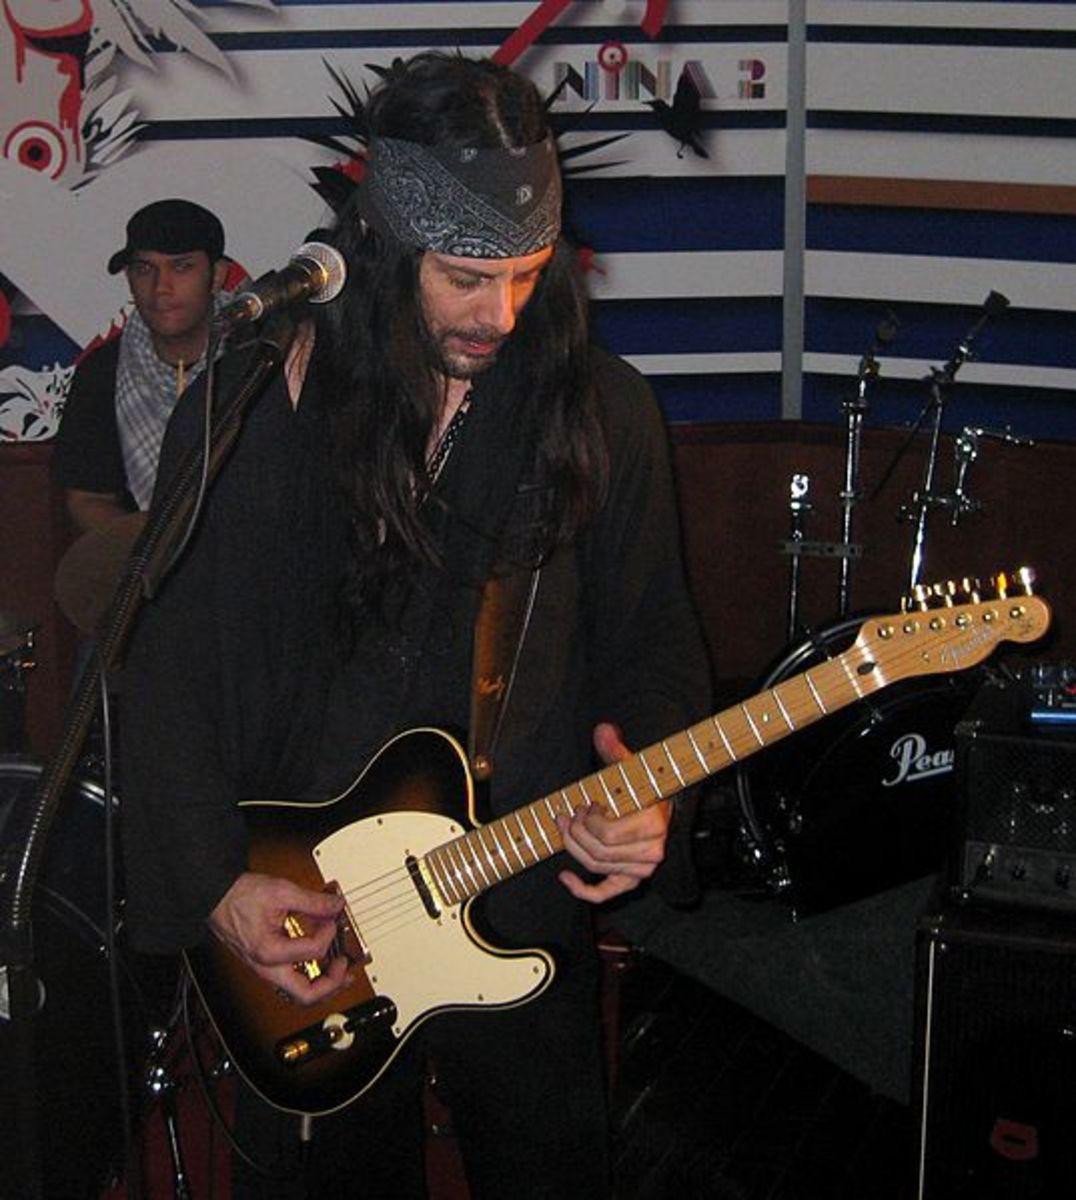 Richie Kotzen and the Fender Telecaster